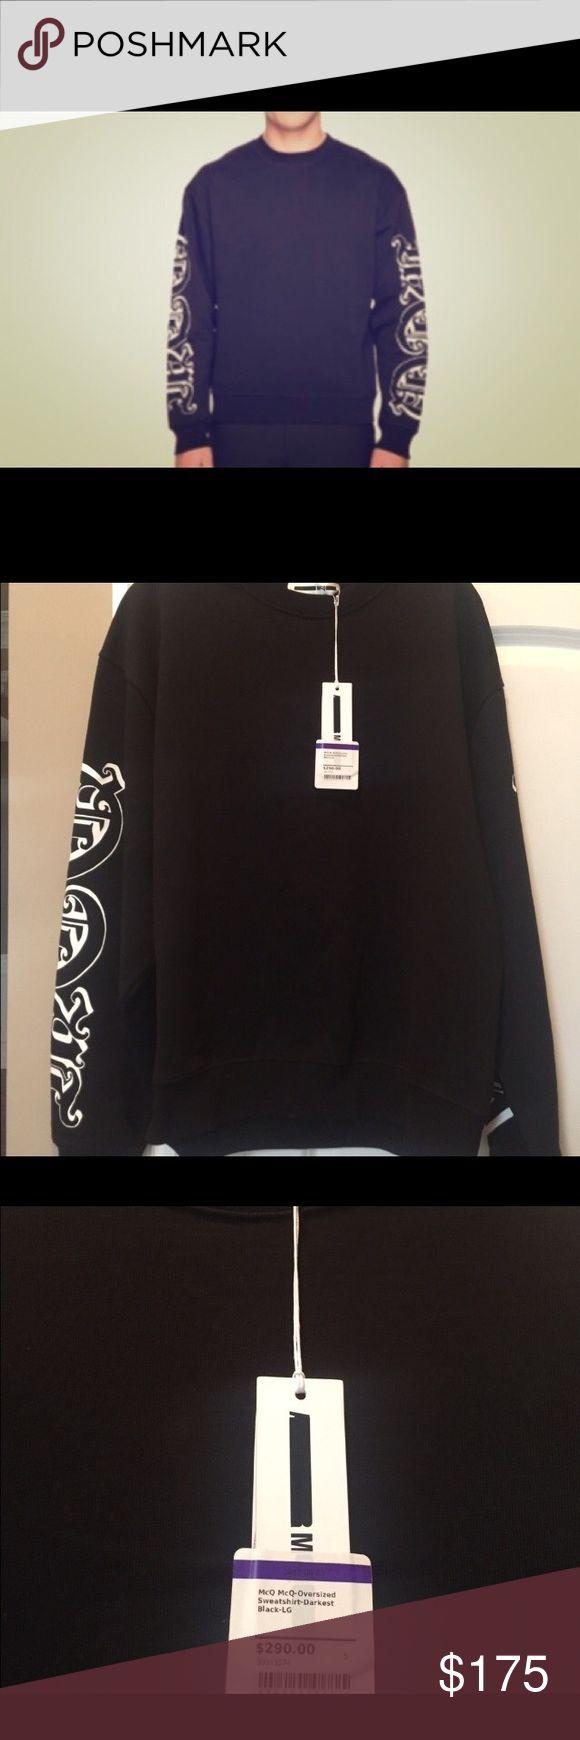 NWT McQ Alexander McQueen oversized sweat shirt L Brand new with tags :). Retail $290! McQ Alexander McQueen Shirts Sweatshirts & Hoodies